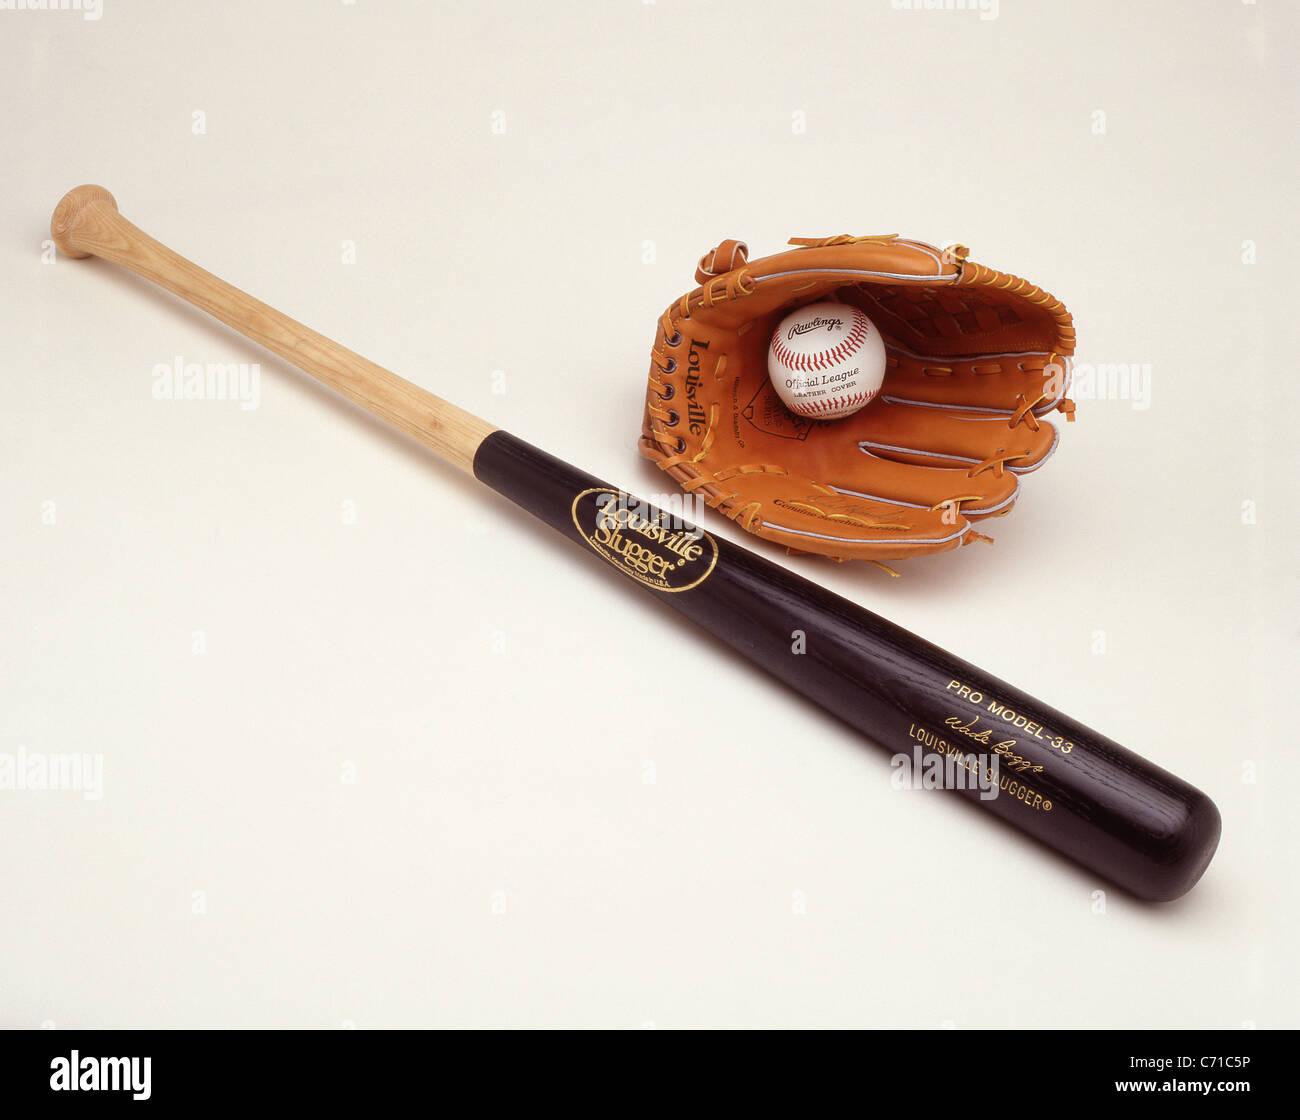 'Louisville Slugger' baseball bat, ball and mitt, United States of America - Stock Image